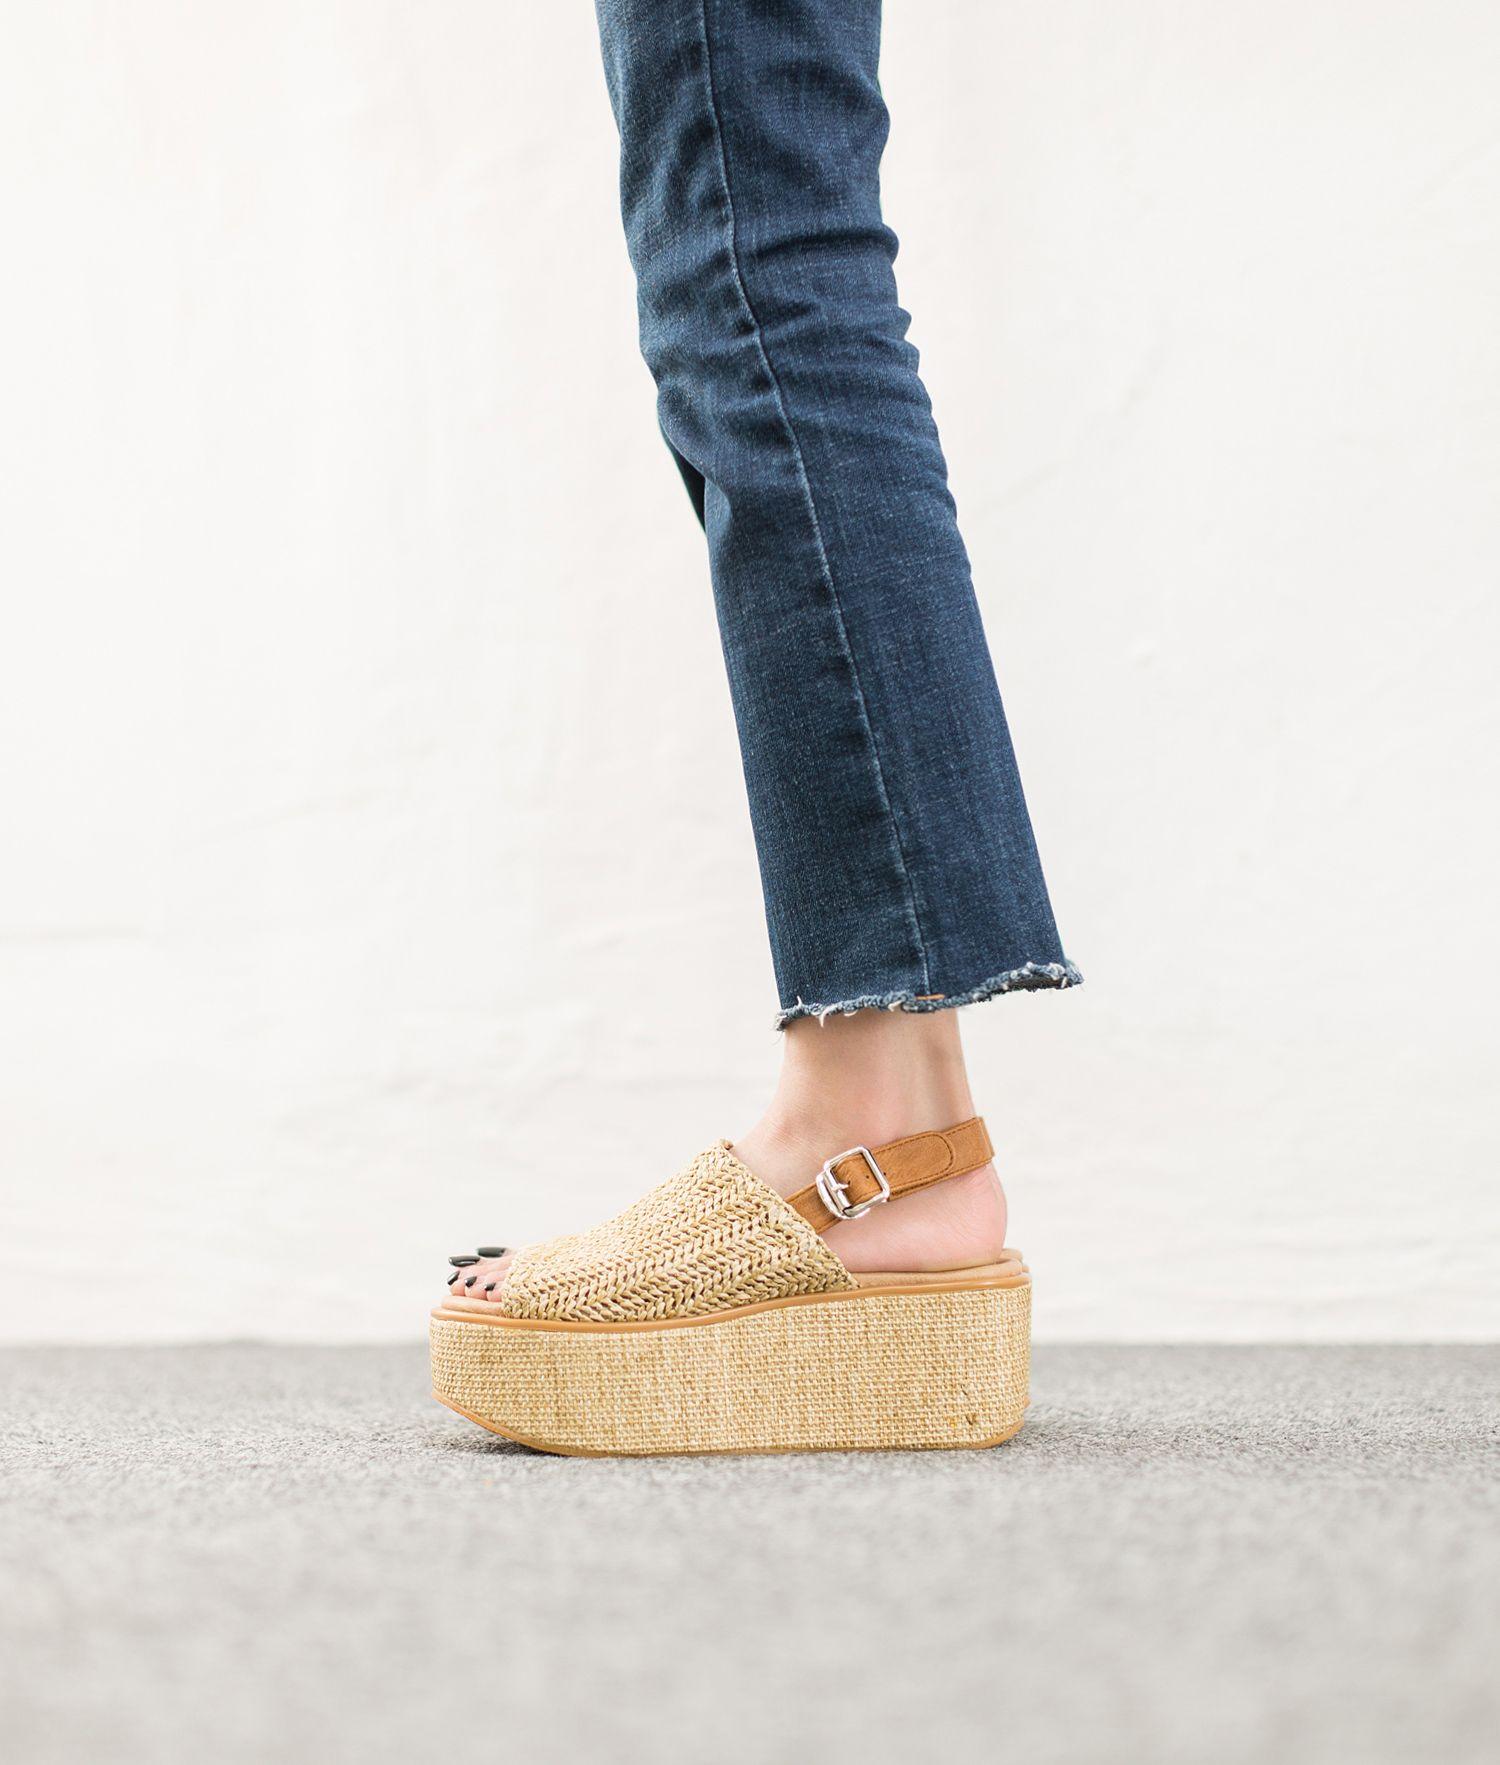 694f448b176 AnnaKastle Womens Woven Slingback Platform Sandals Beige